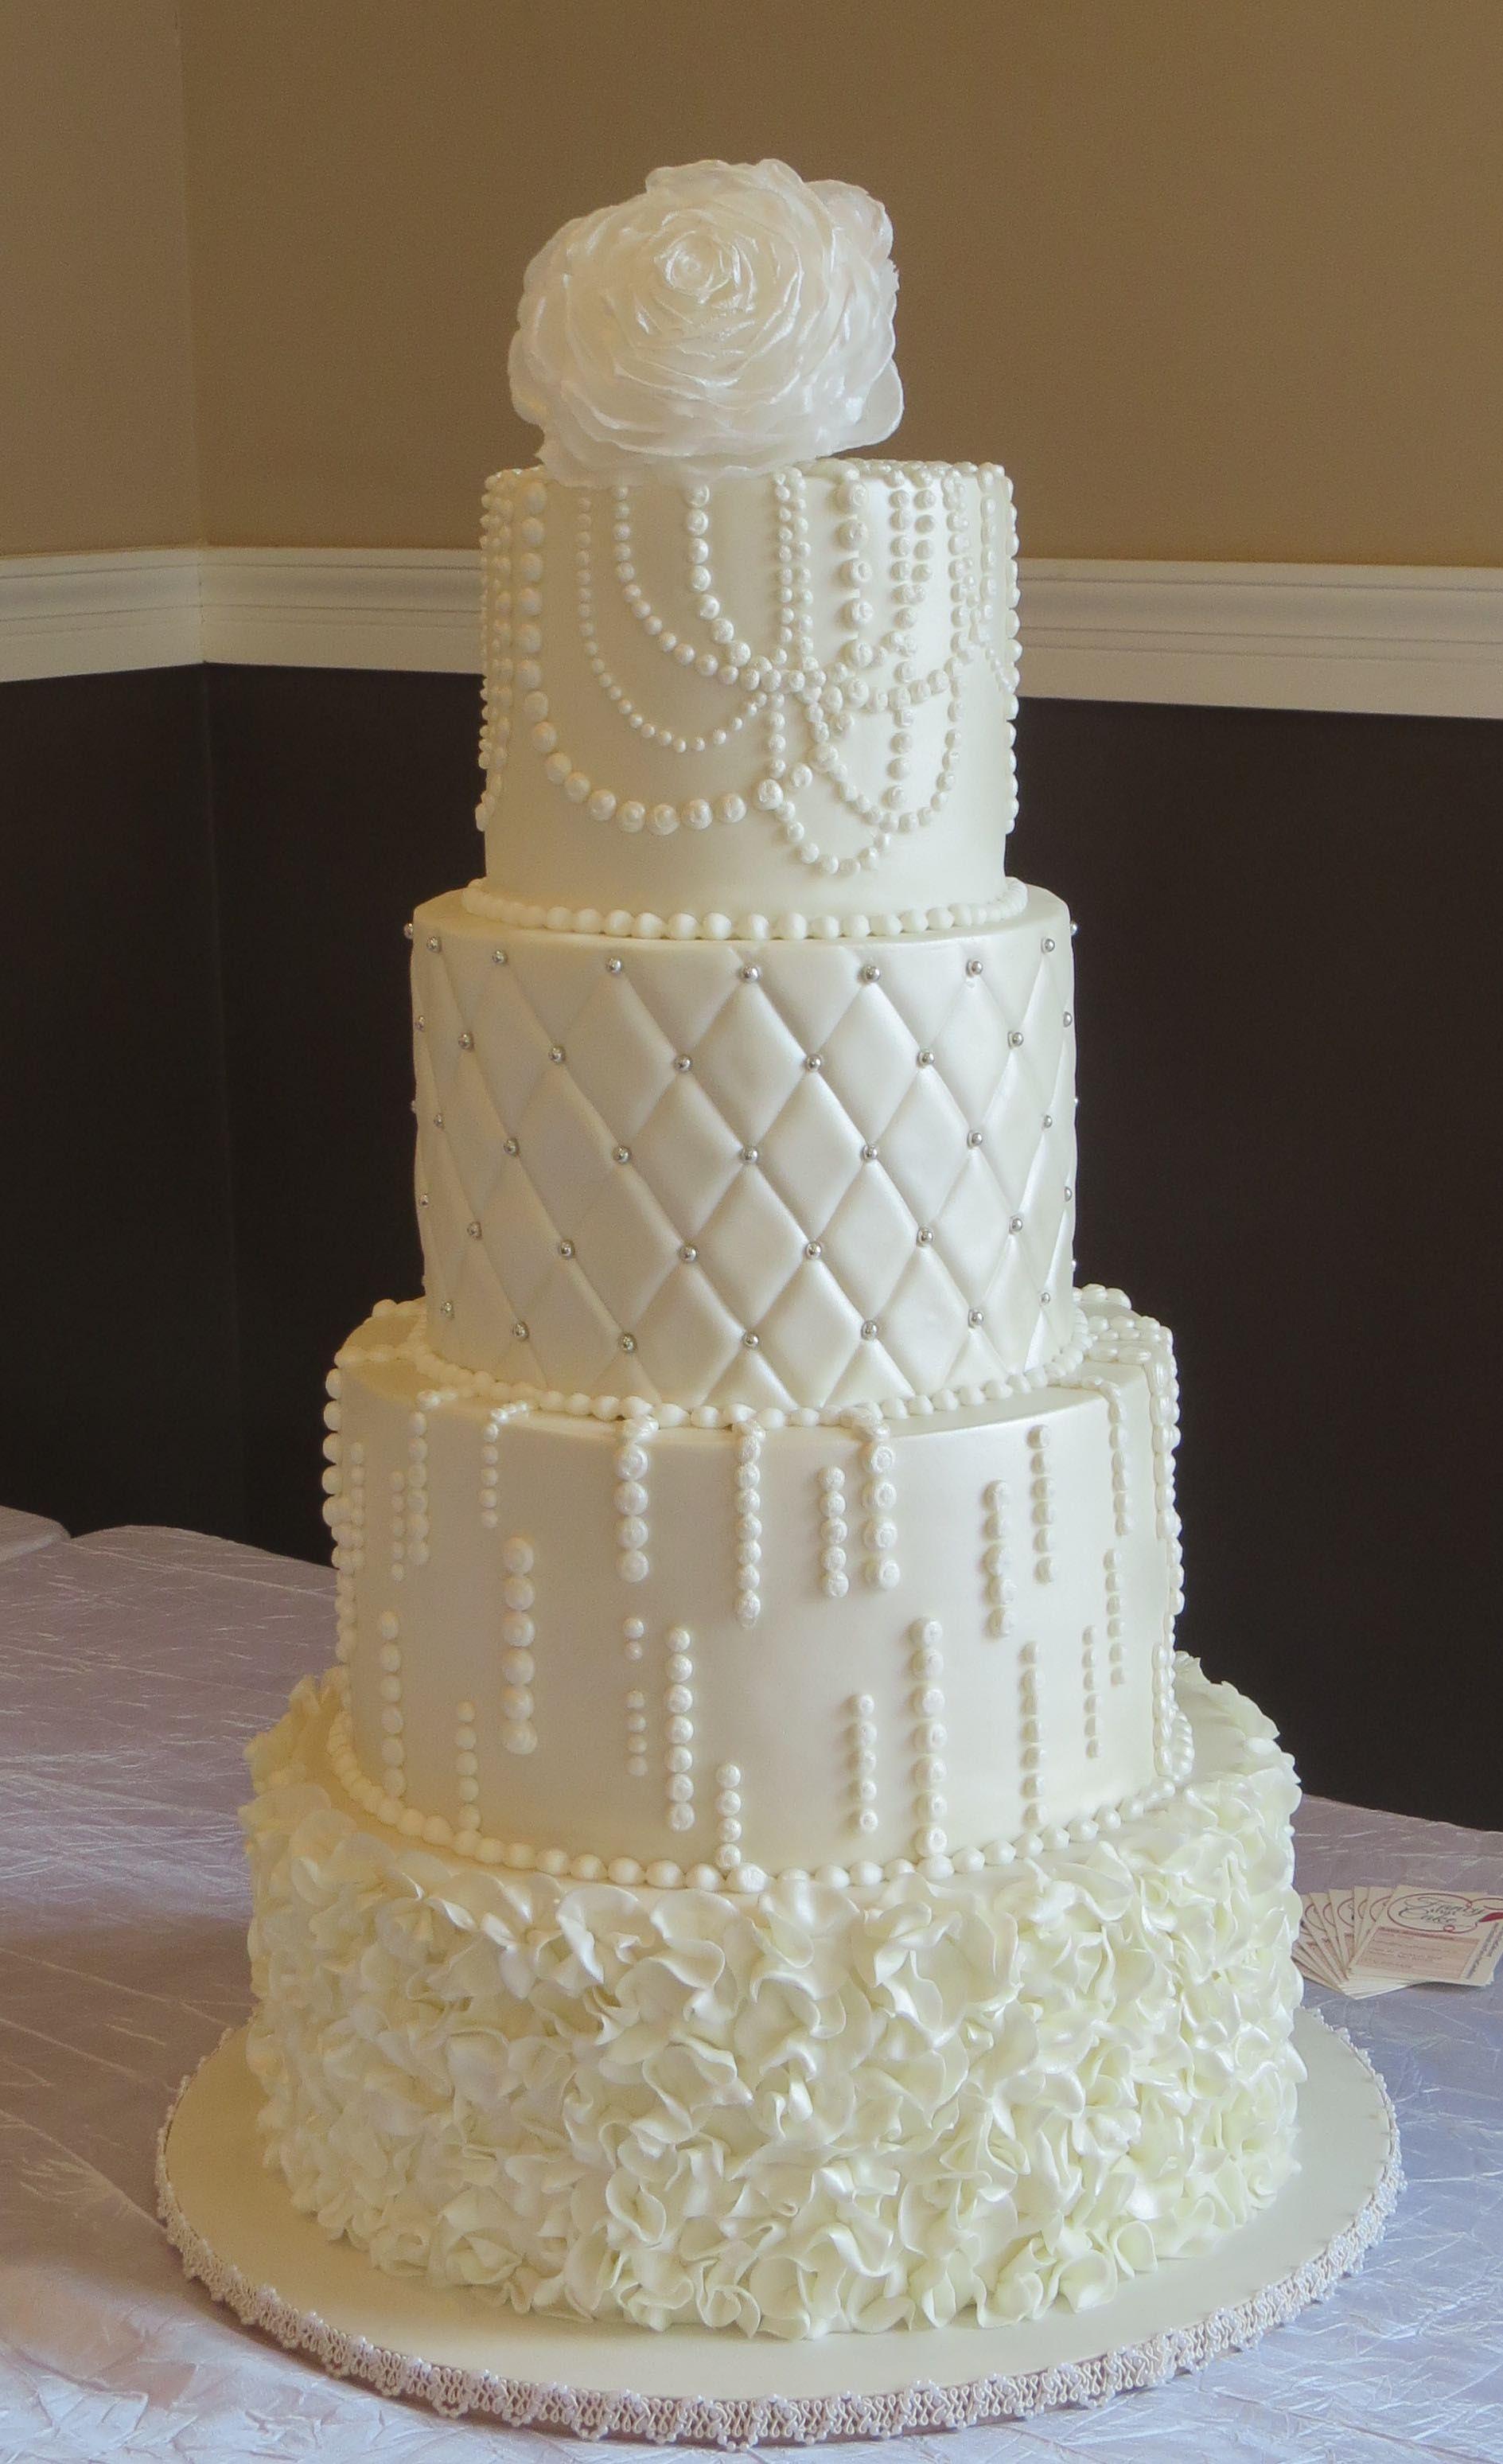 White Wedding Cake Decorated With Fondant Ruffles Royal Icing